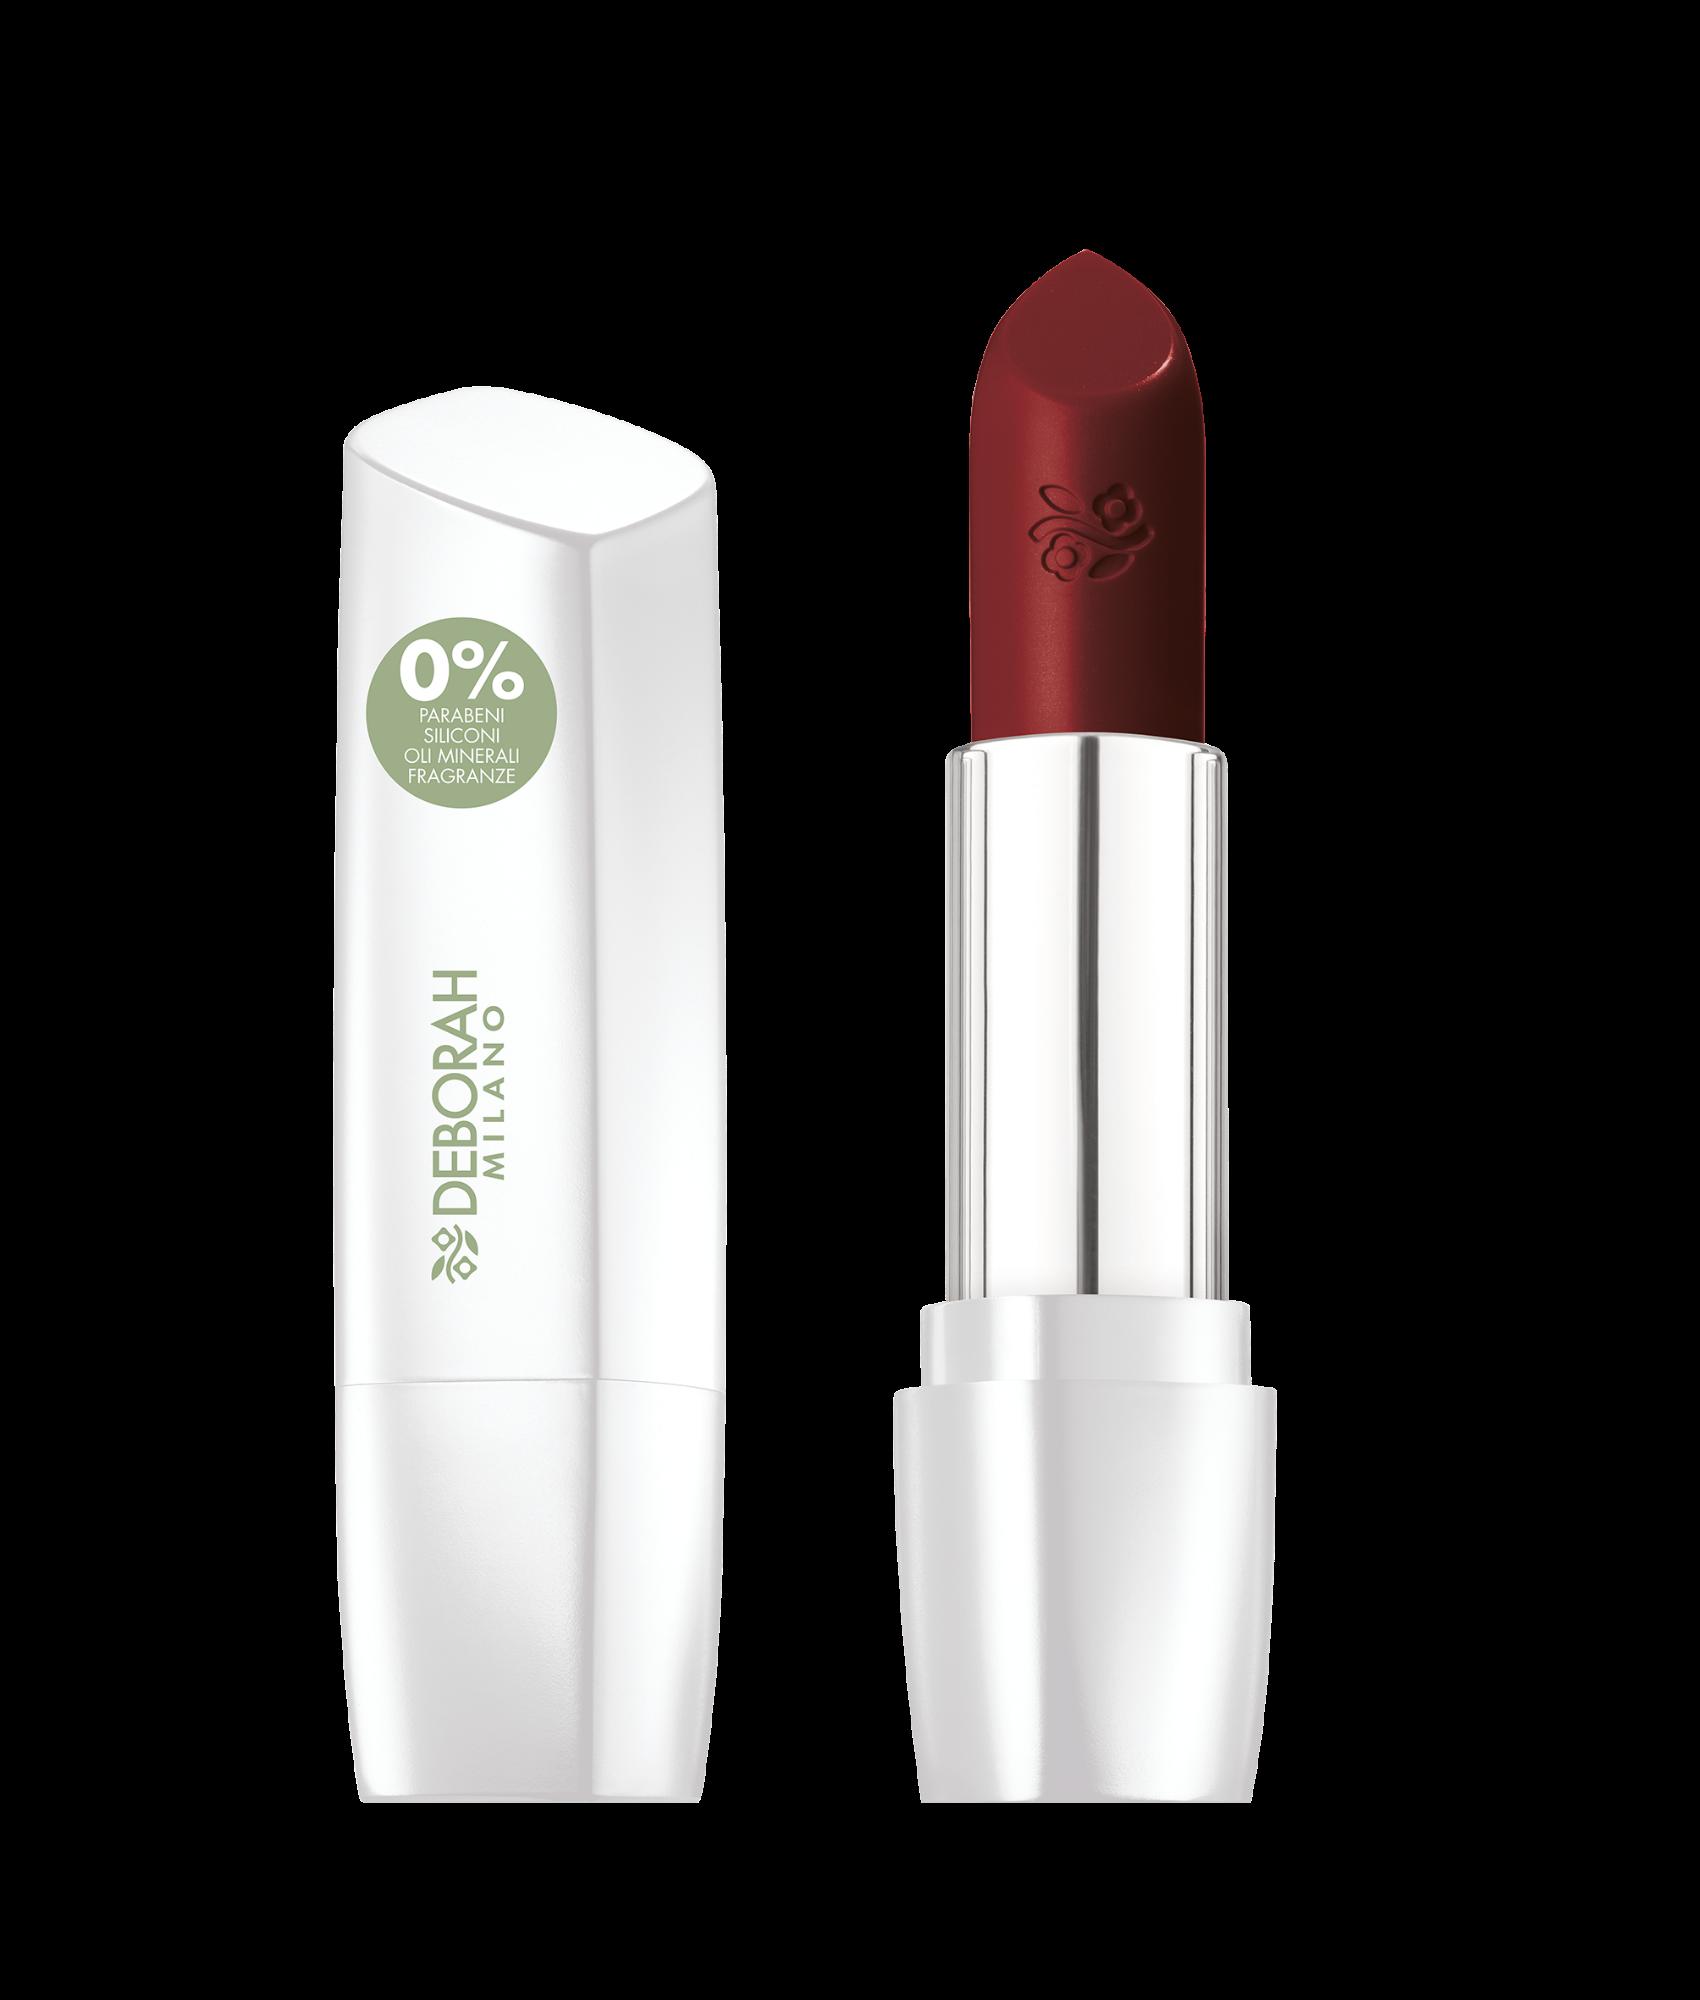 Lūpų dažai DEBORAH FORMULA PURA 12 DARK RED, 4,4 g